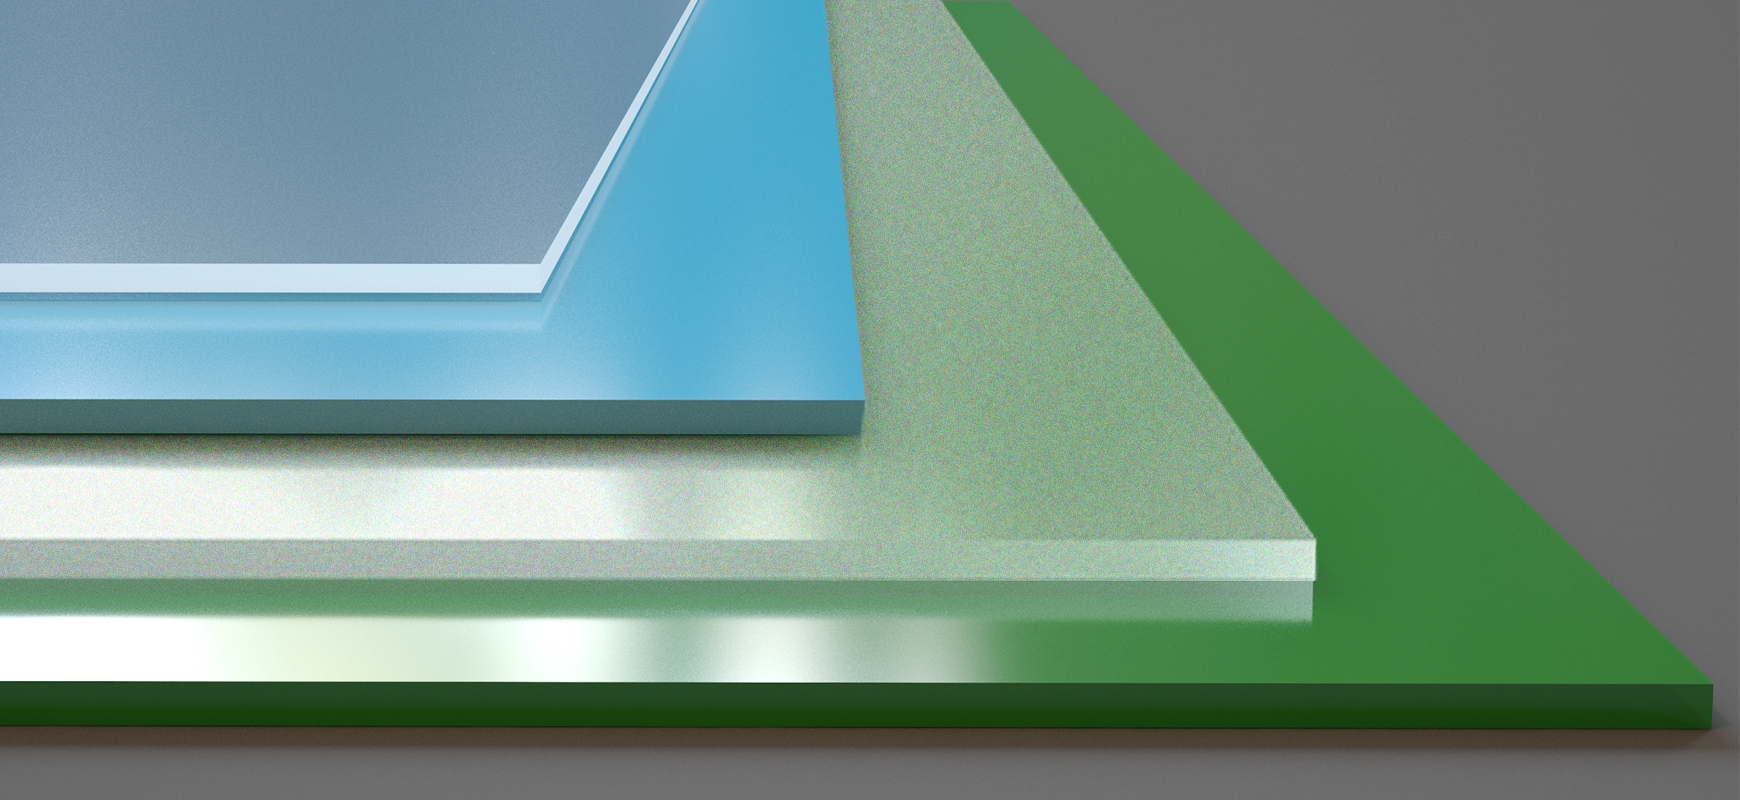 acrylic-materials